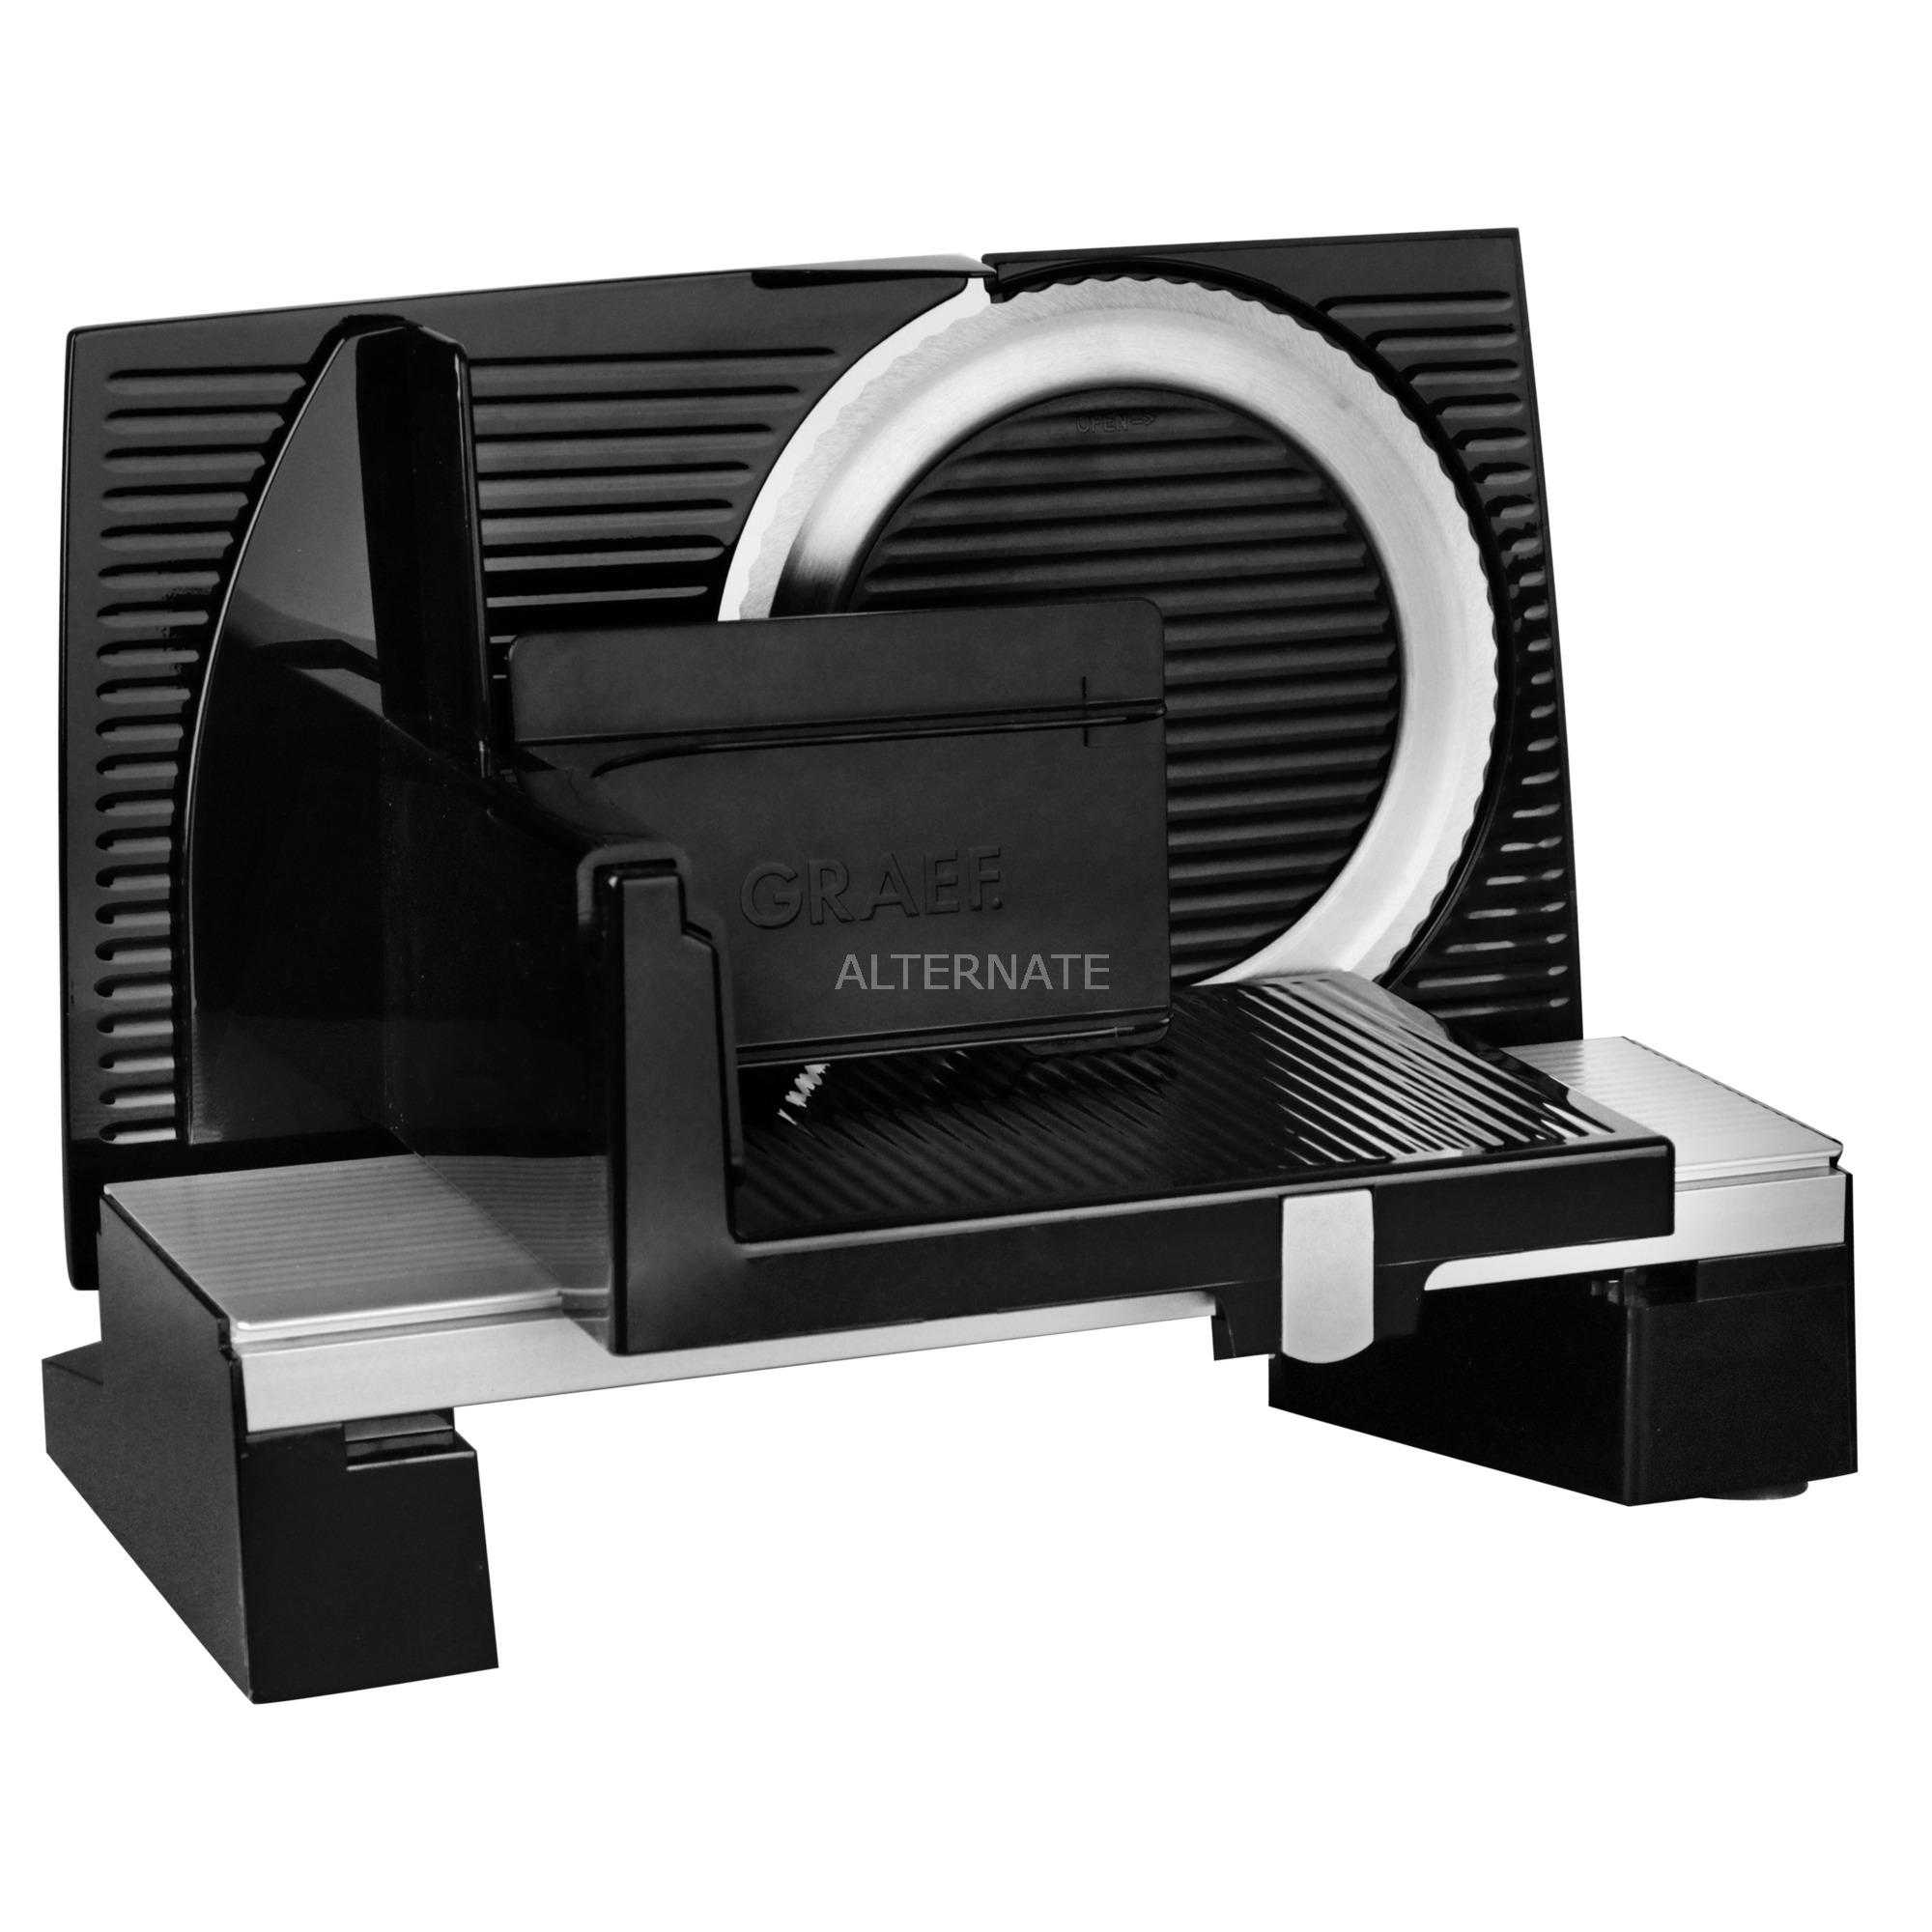 S 10002 rebanadora Eléctrico Negro Aluminio 170 W, Cortatodo